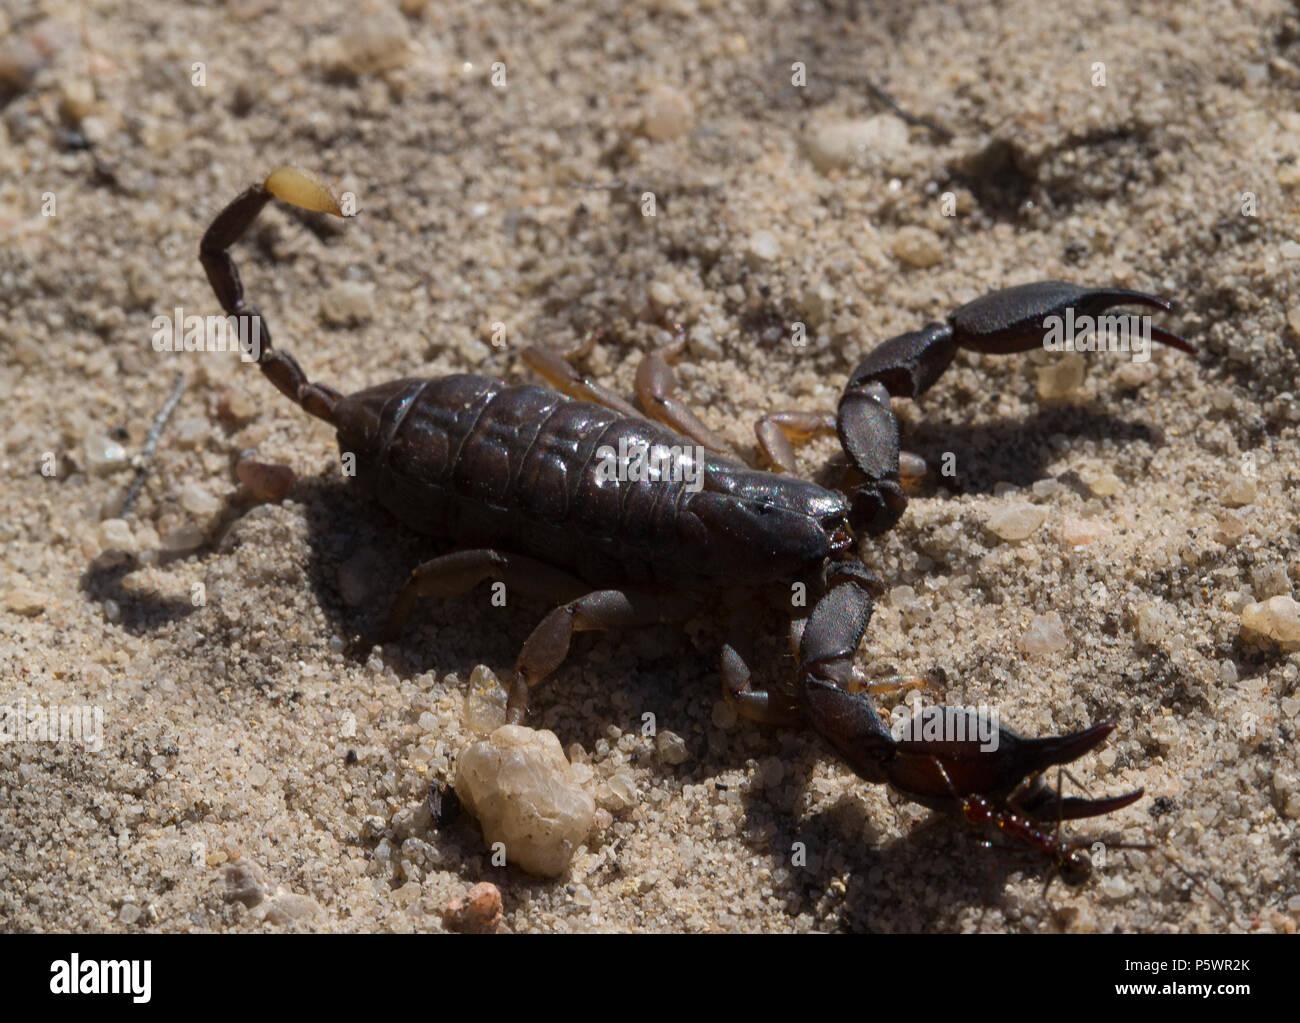 Madagascan scorpion - Stock Image